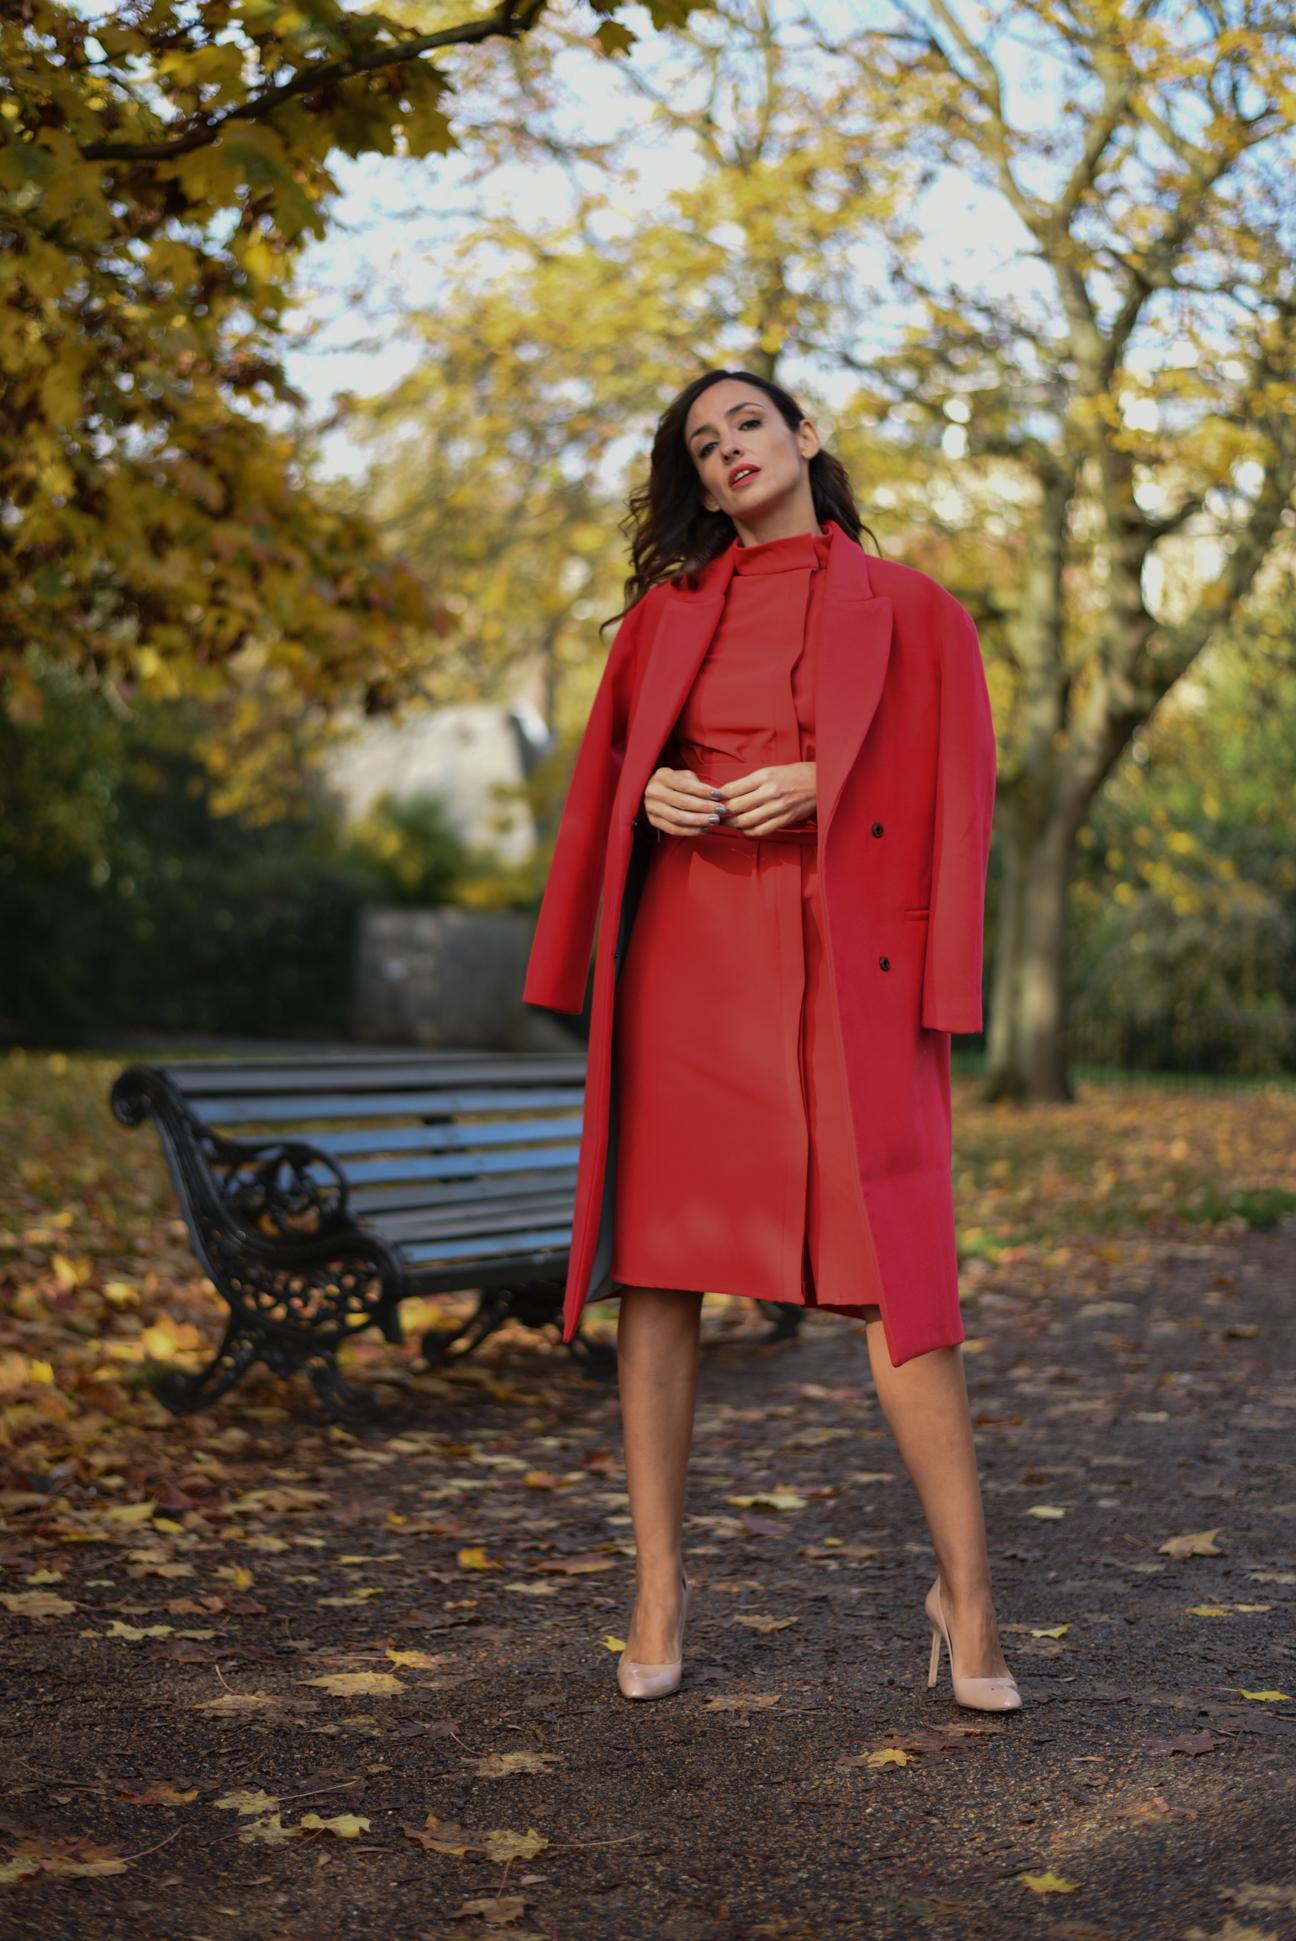 el-blog-de-silvia-invitada-perfecta-boda-abrigo-rojo-pintini